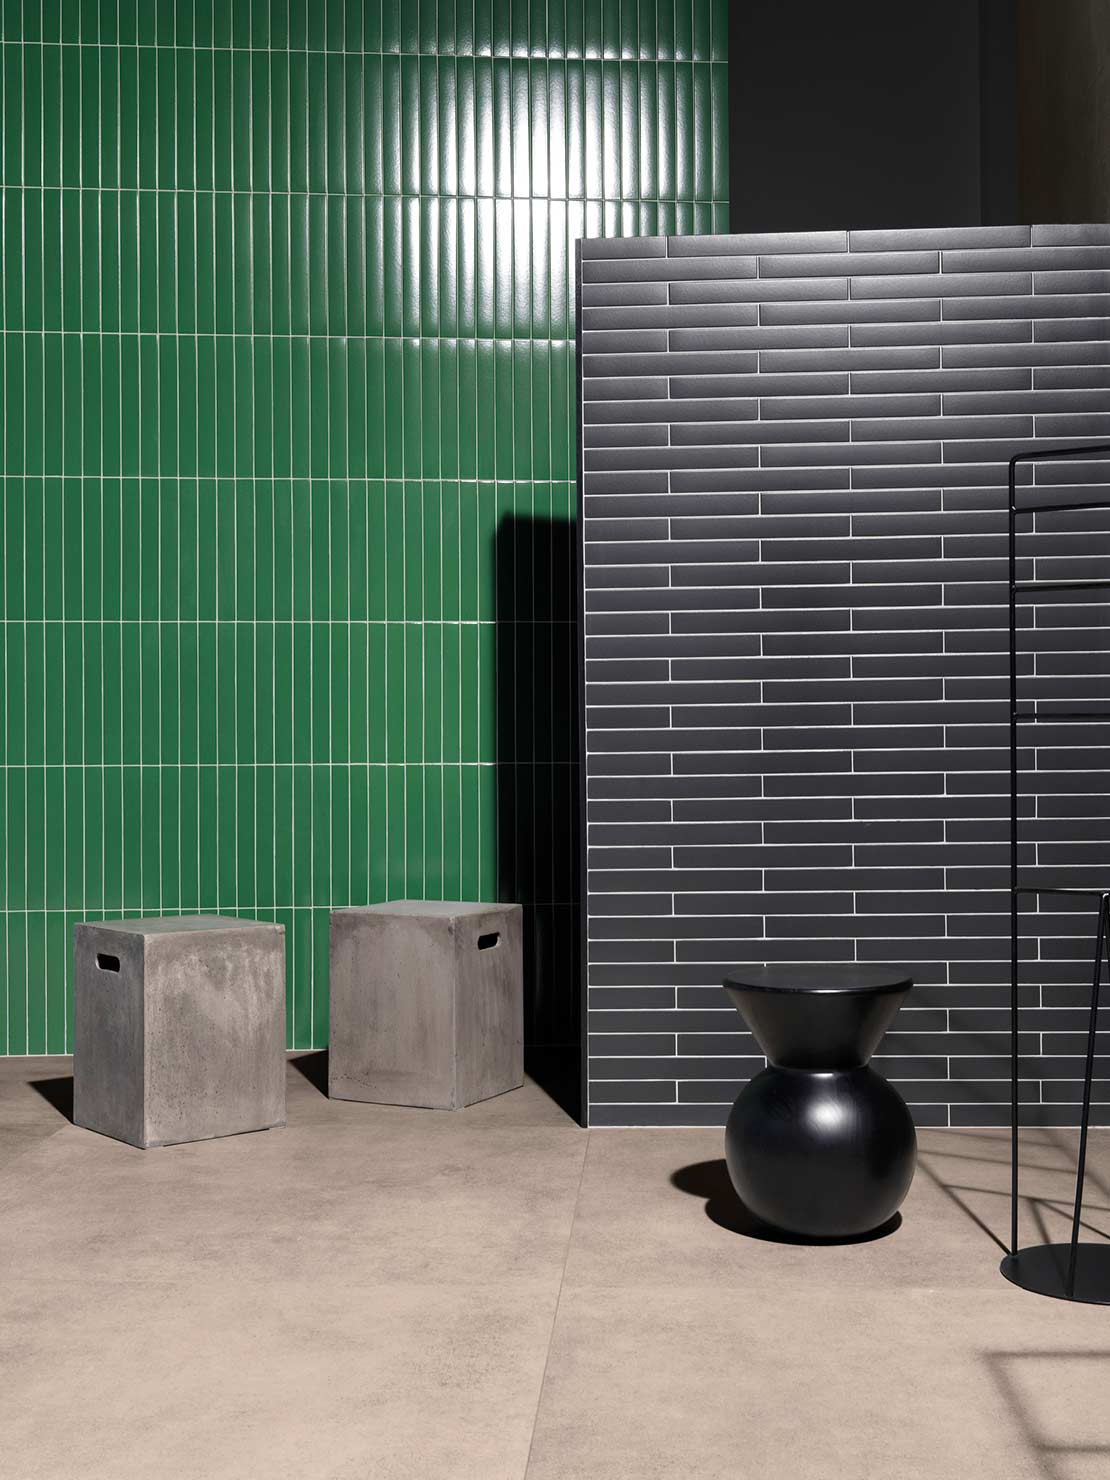 Portobello - Le Corbusier hochwertige Keramikfliesen & Designfliesen